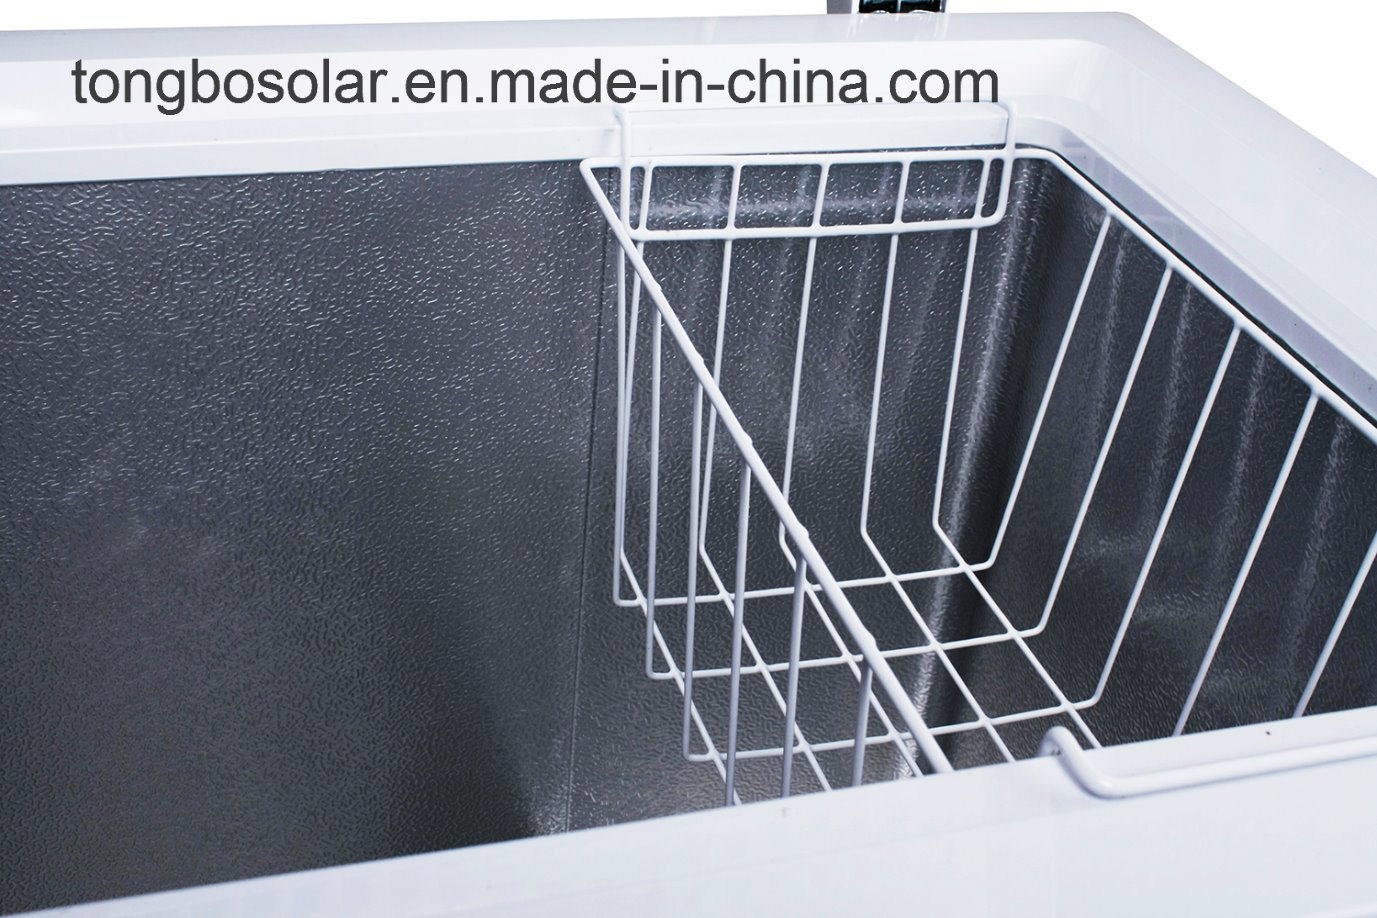 DC 12V 24V Solar Freezer Commercial Chest Freezer 282L